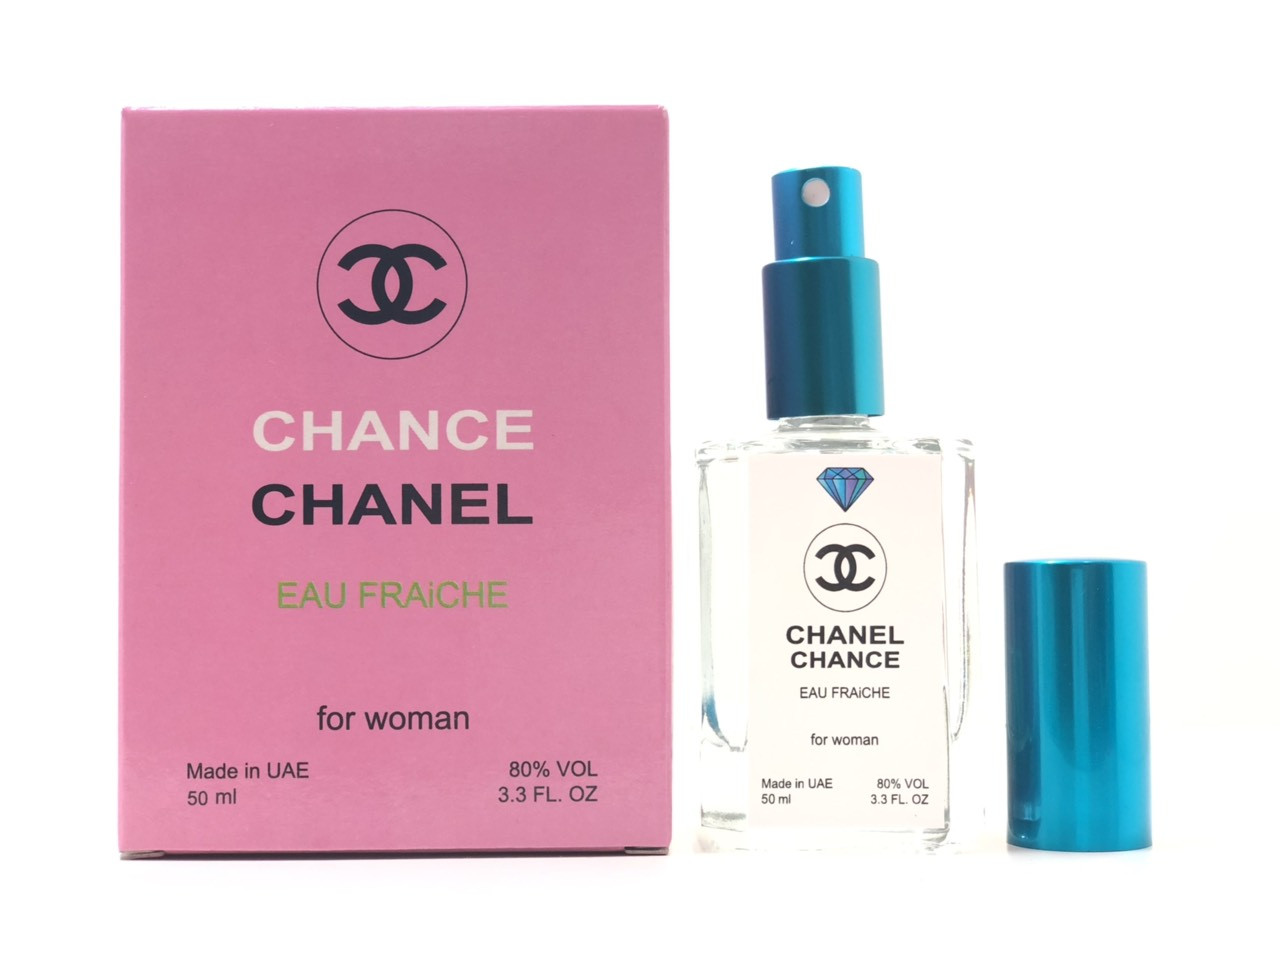 Парфюм Chanel Chance Eau Fraiche (Шанель Шанс Фреш) 50 мл Diamond - реплика